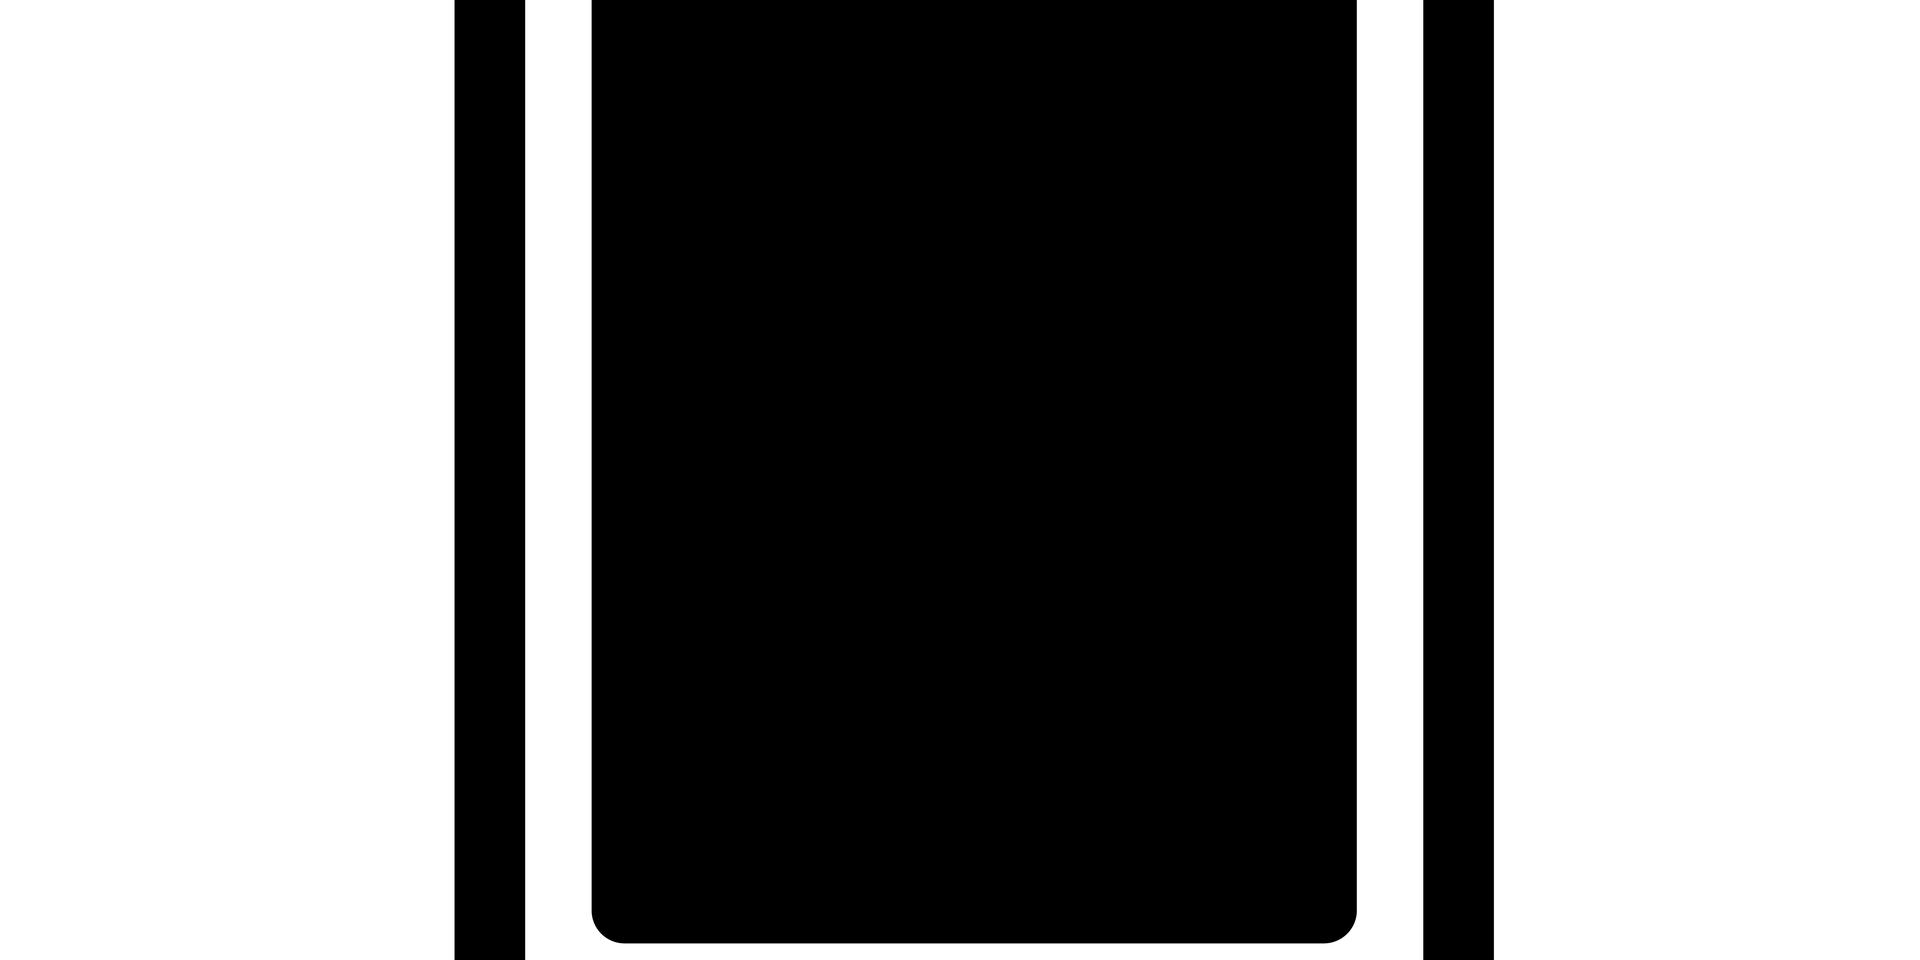 smart device icon